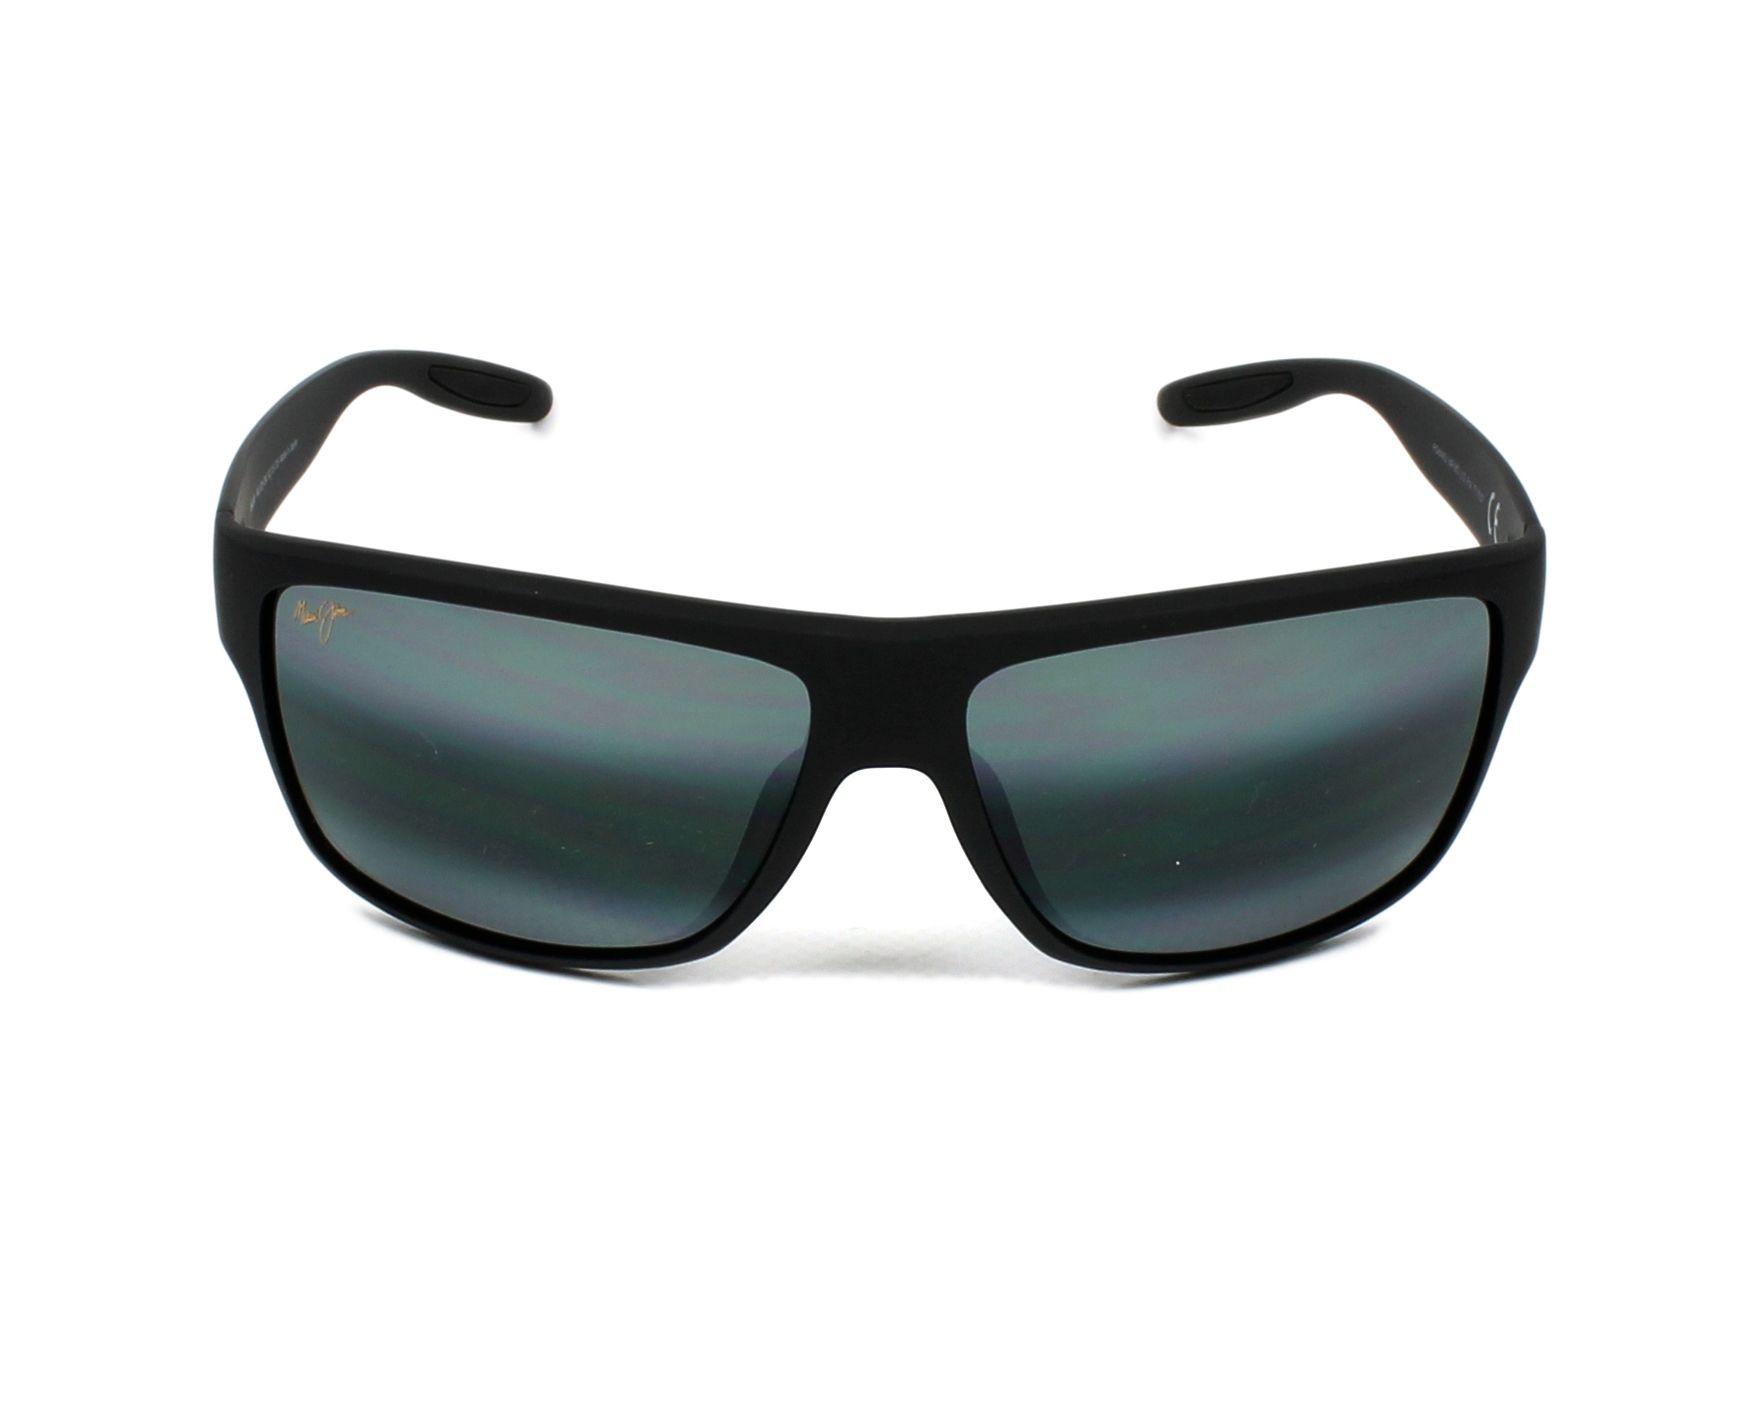 411baffb6135 Sunglasses Maui Jim 528 2M 62-15 Black front view